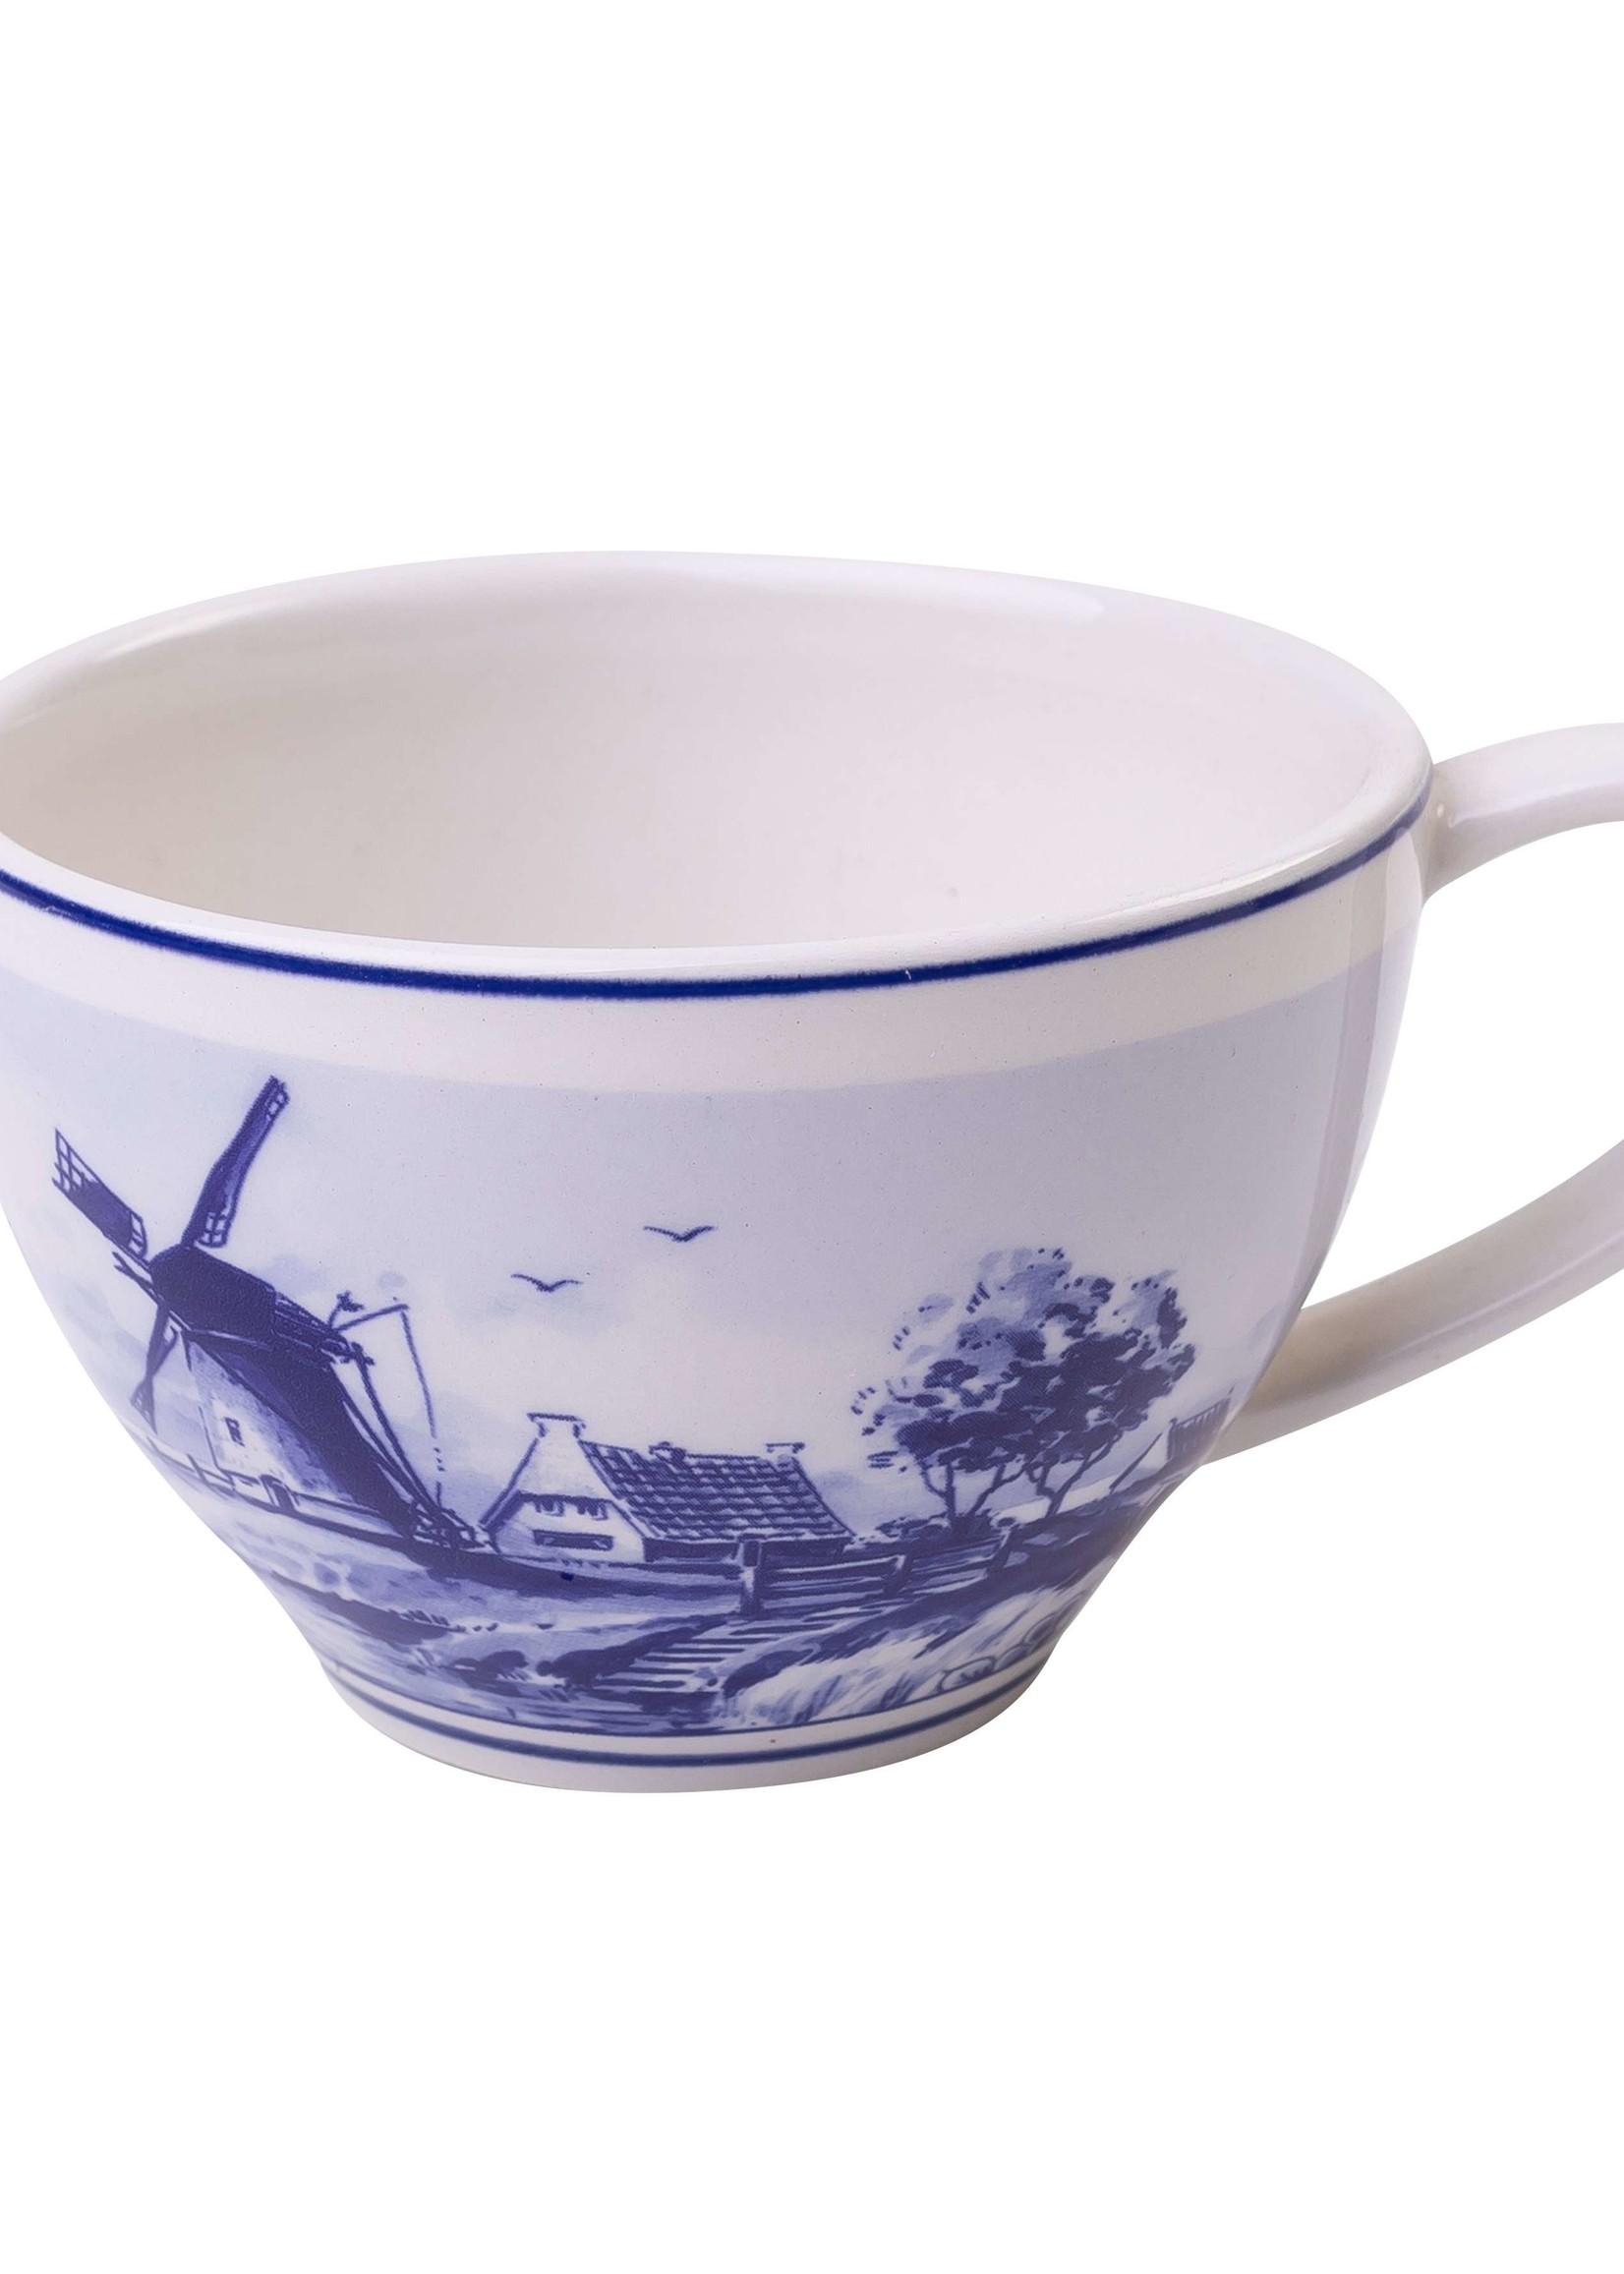 Delft Blue Tea Mug of a Dutch Landscape with a Windmill, 250 ml / 8,5 oz